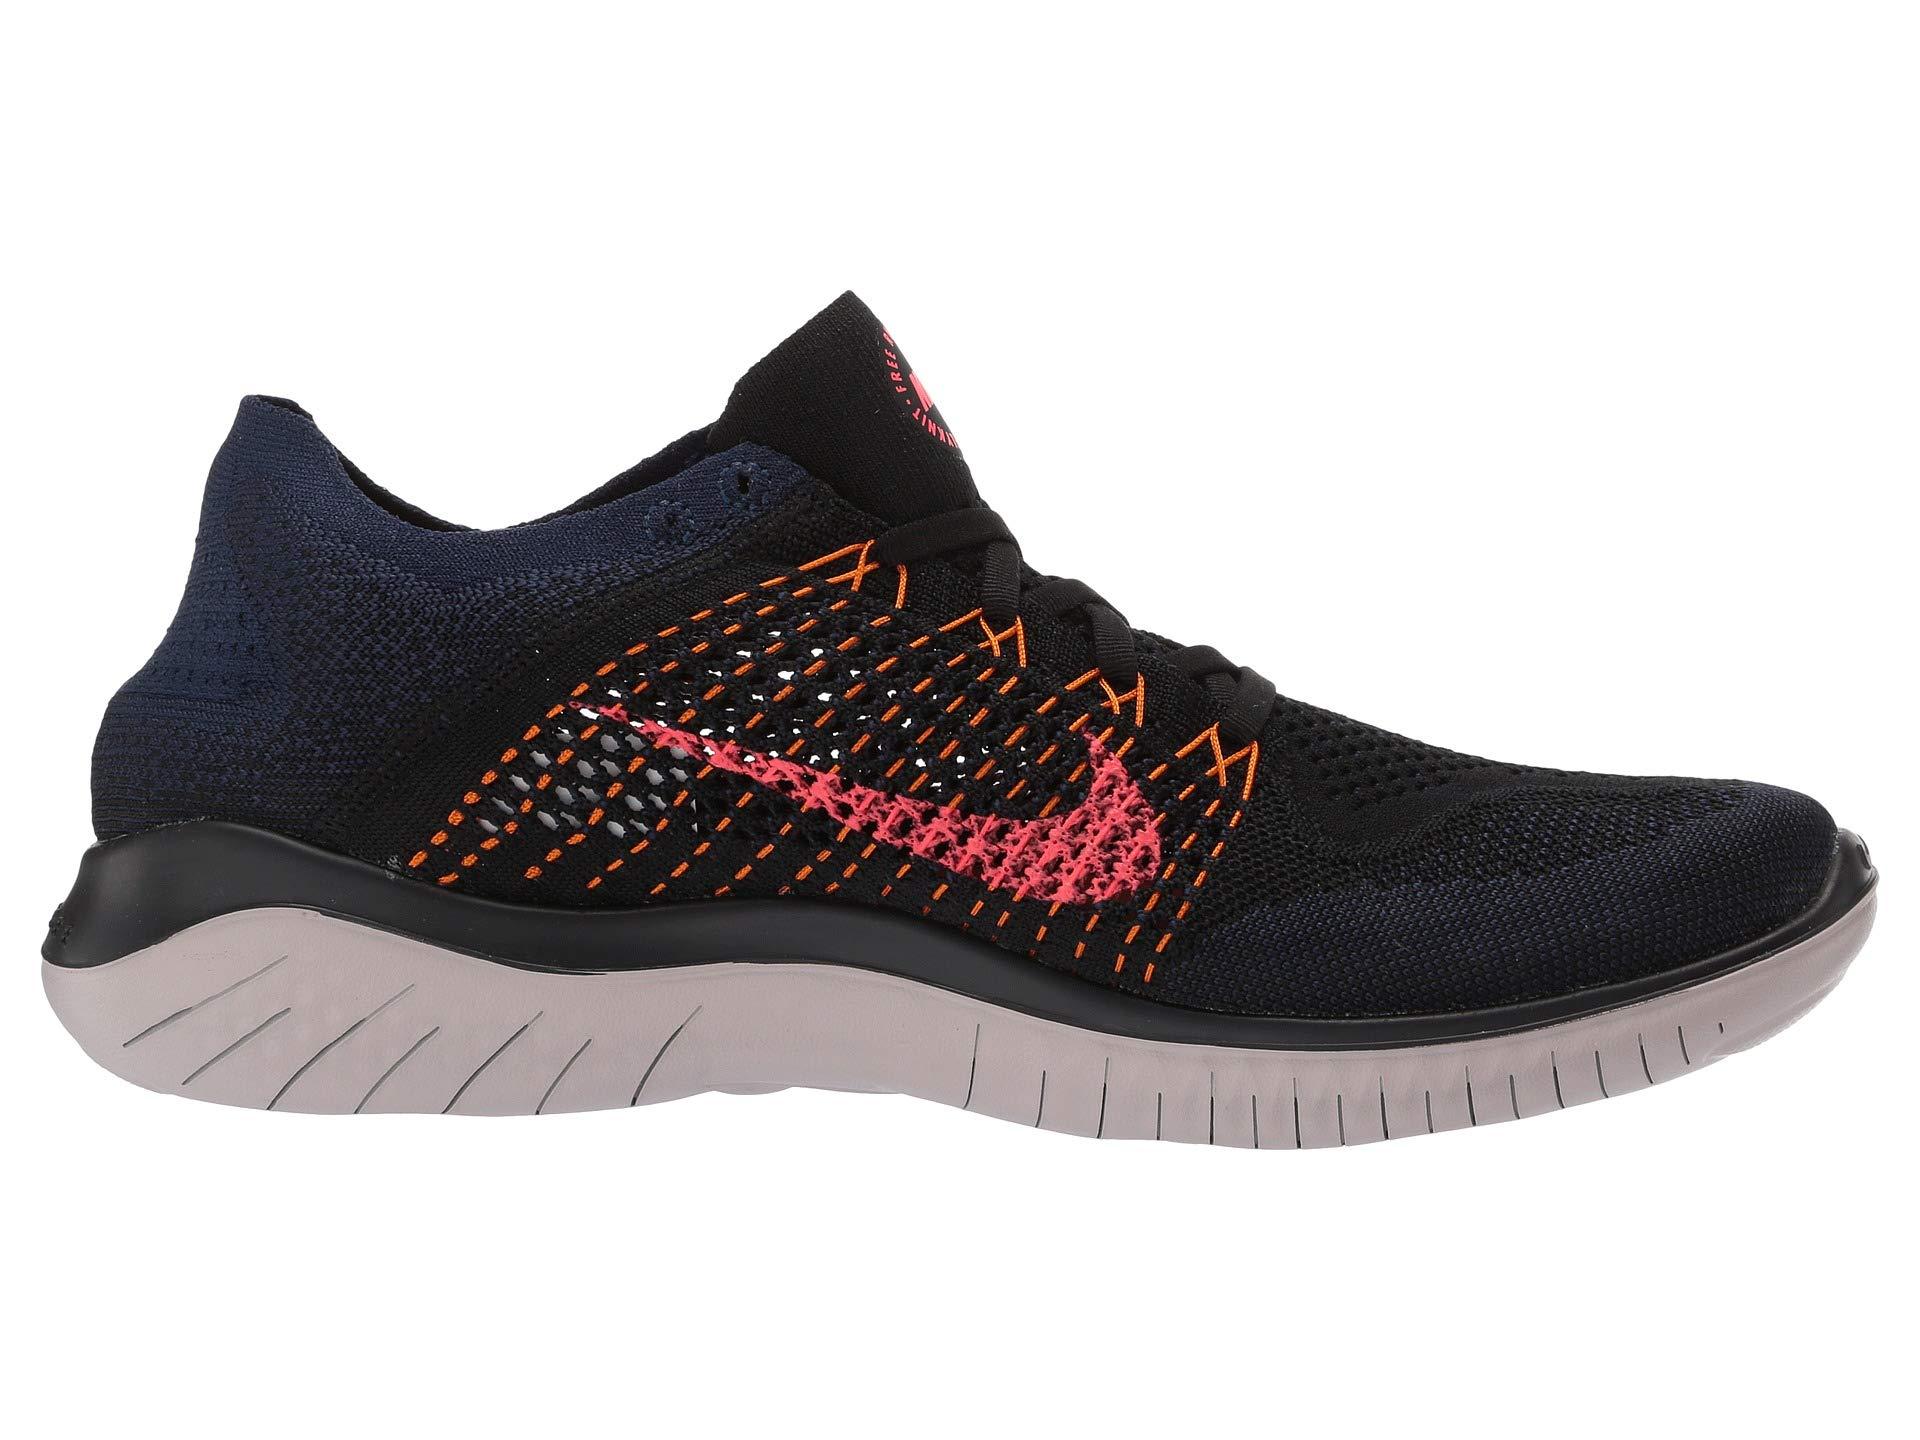 Flyknit Nike Rn flash Peel orange Black Crimson Free rTHTBRwqxE